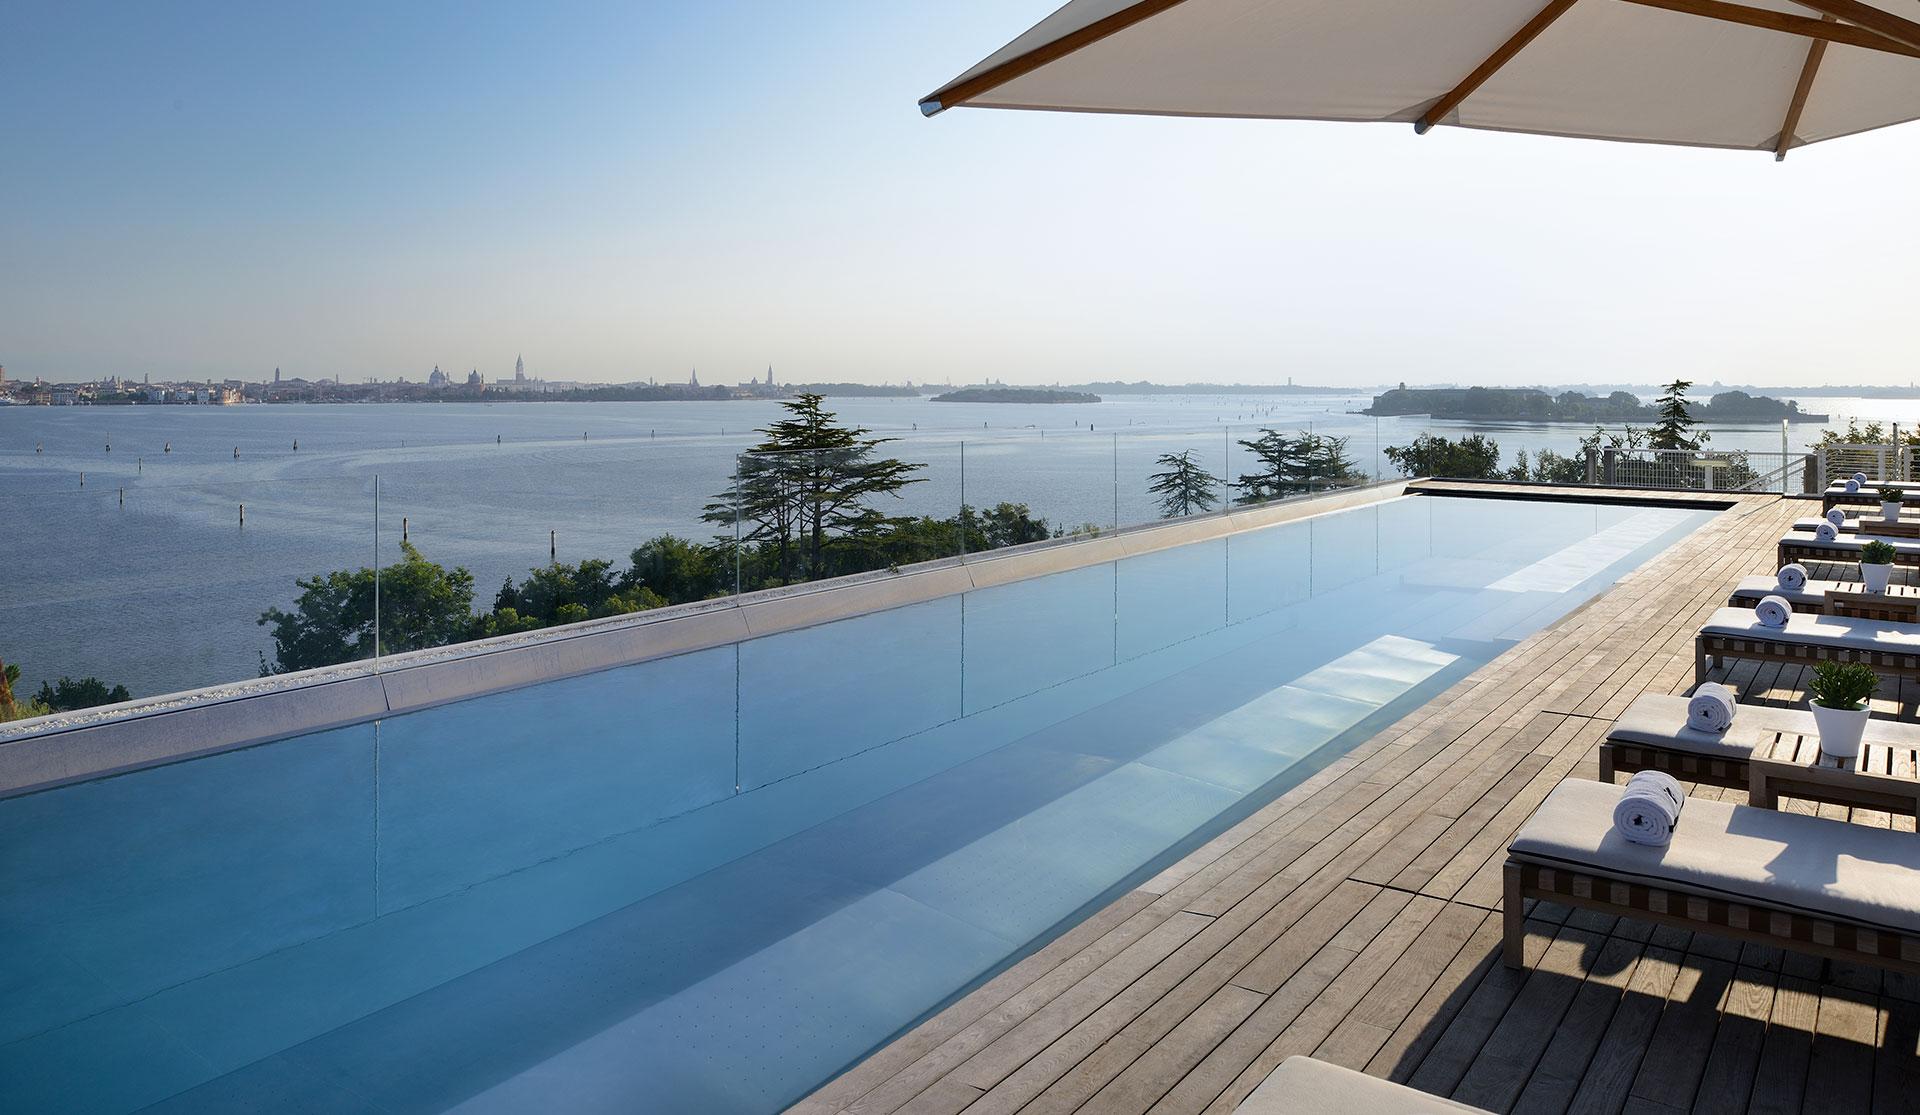 JW Marriott Venice Resort & Spa | Matteo Thun & Partners